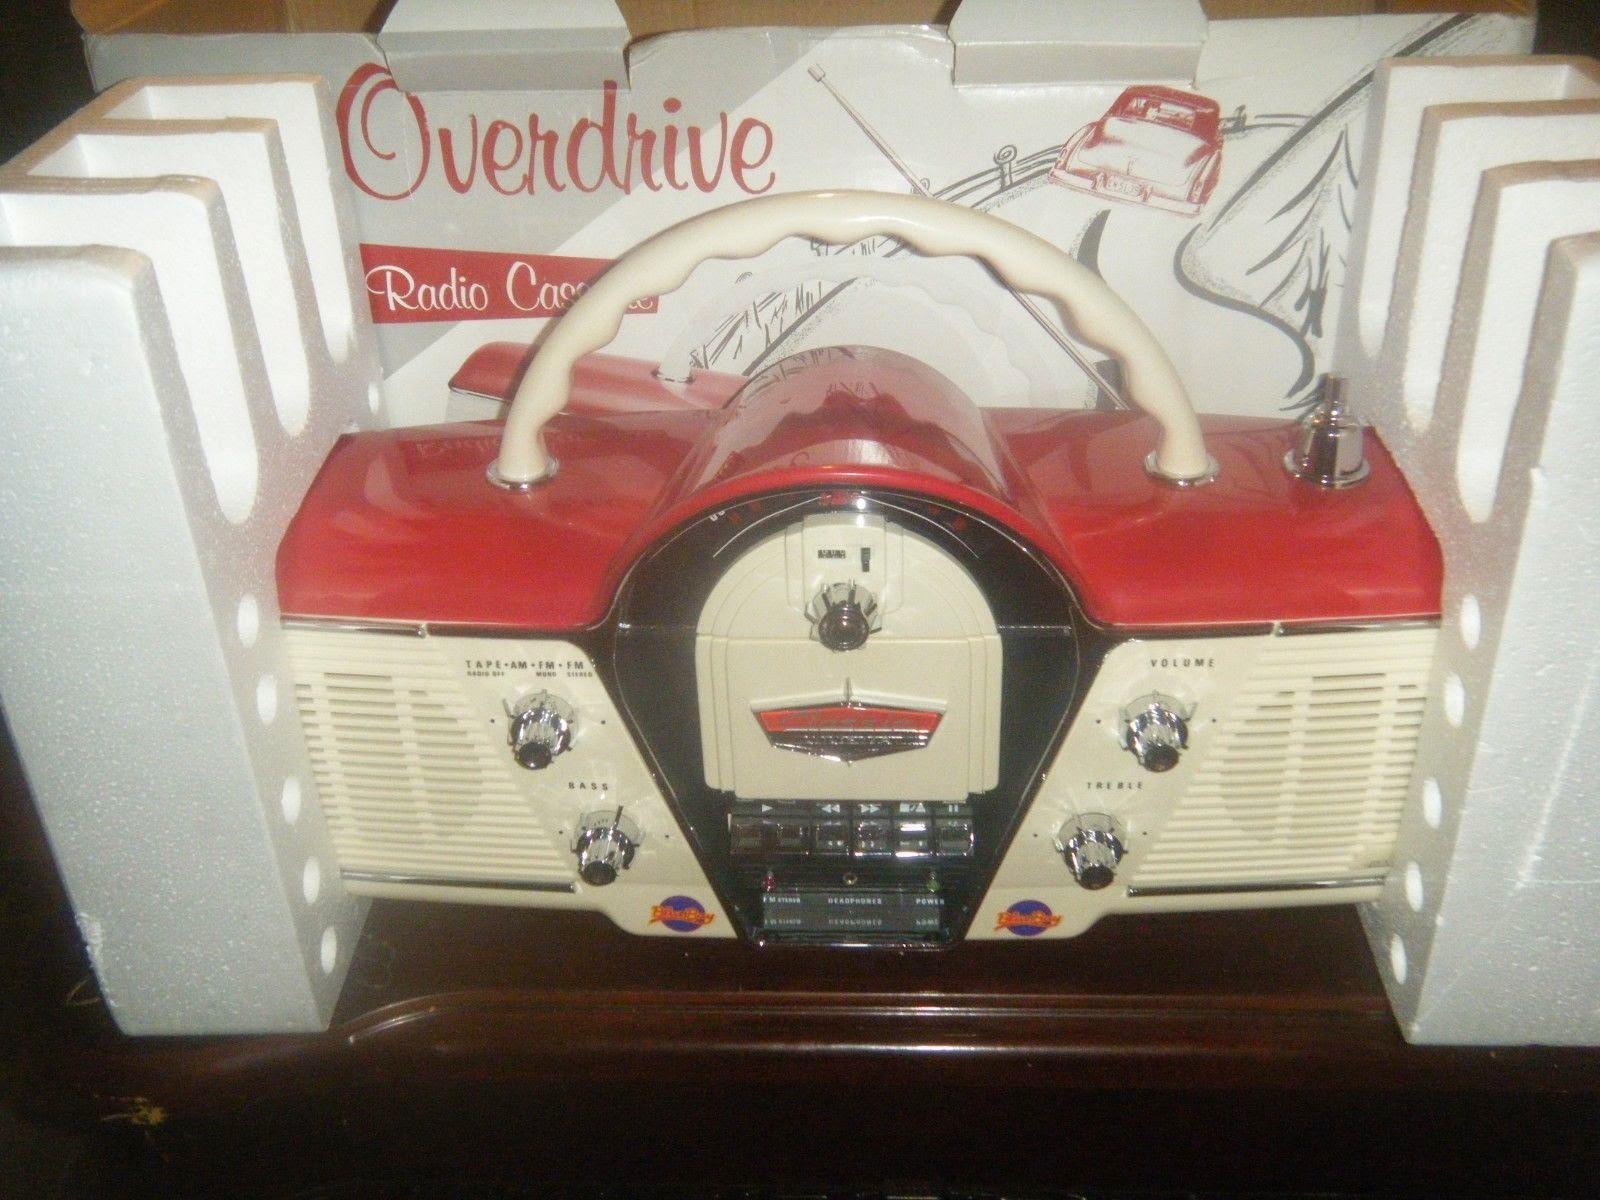 New Classic Cicena Overdrive Portable AM/FM Cassette Radio